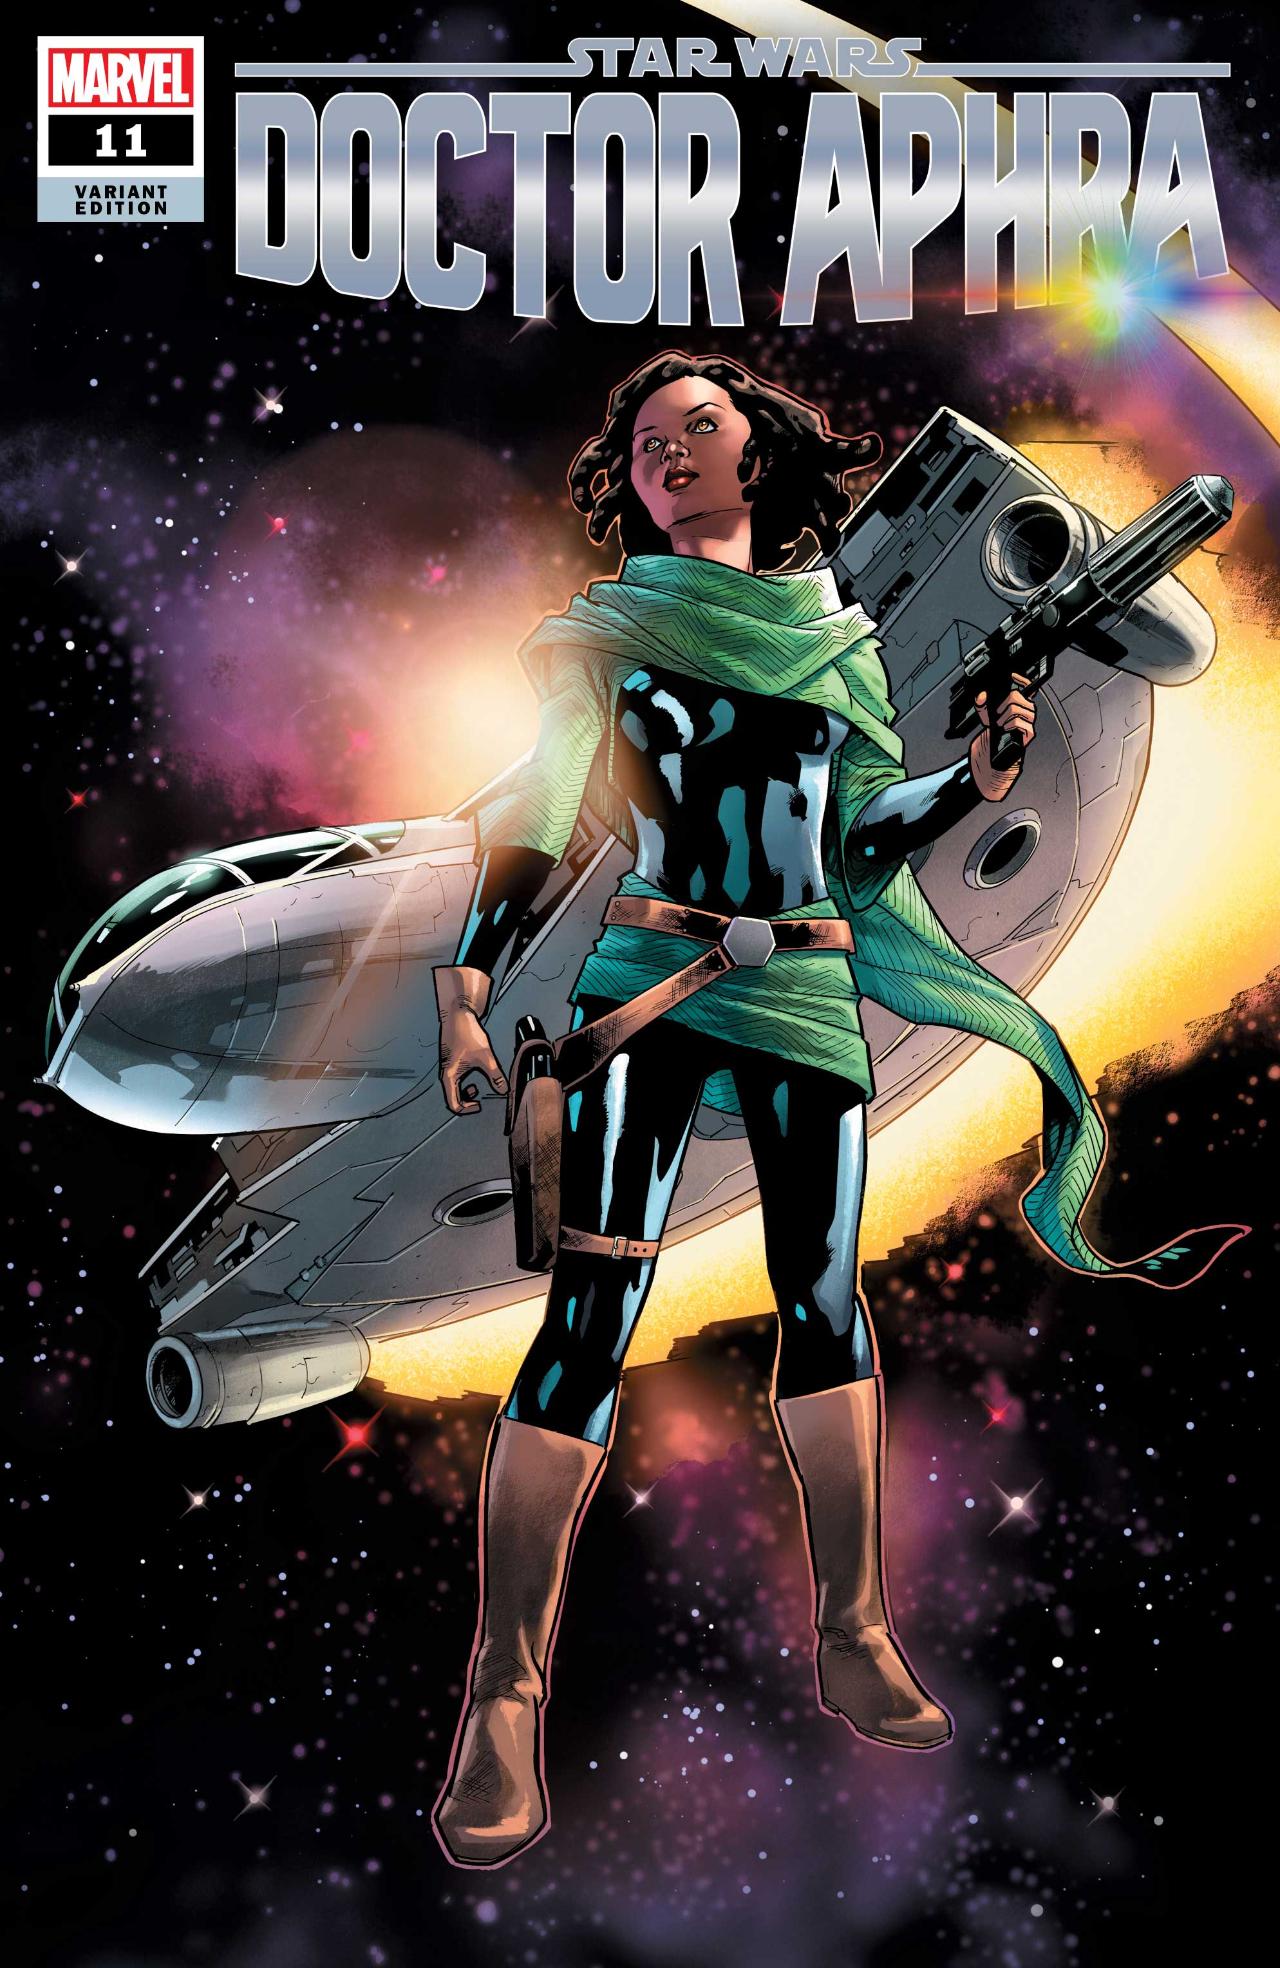 Star Wars: Doctor Aphra # 11